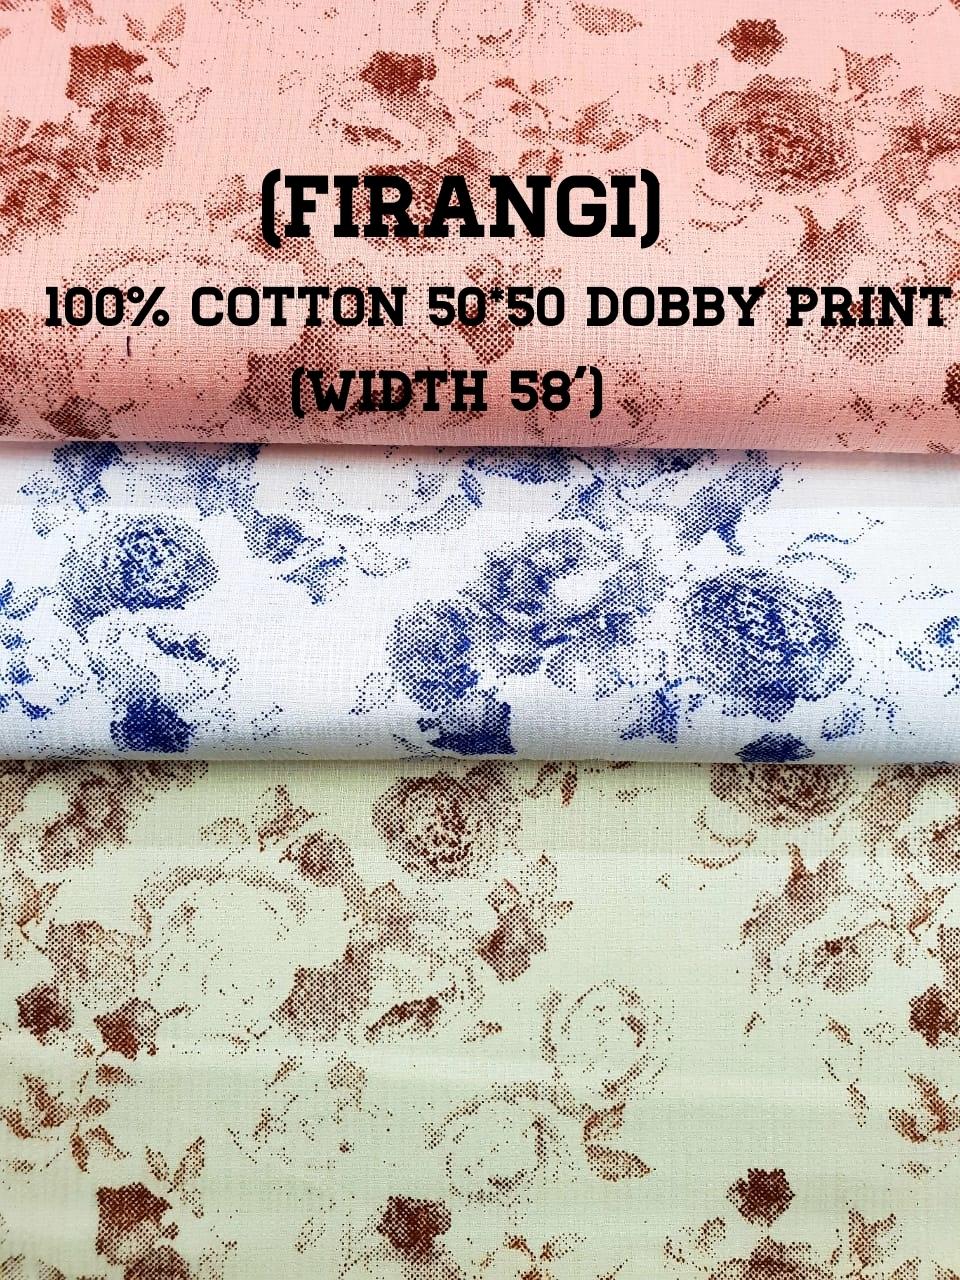 Dobby printed fabrics